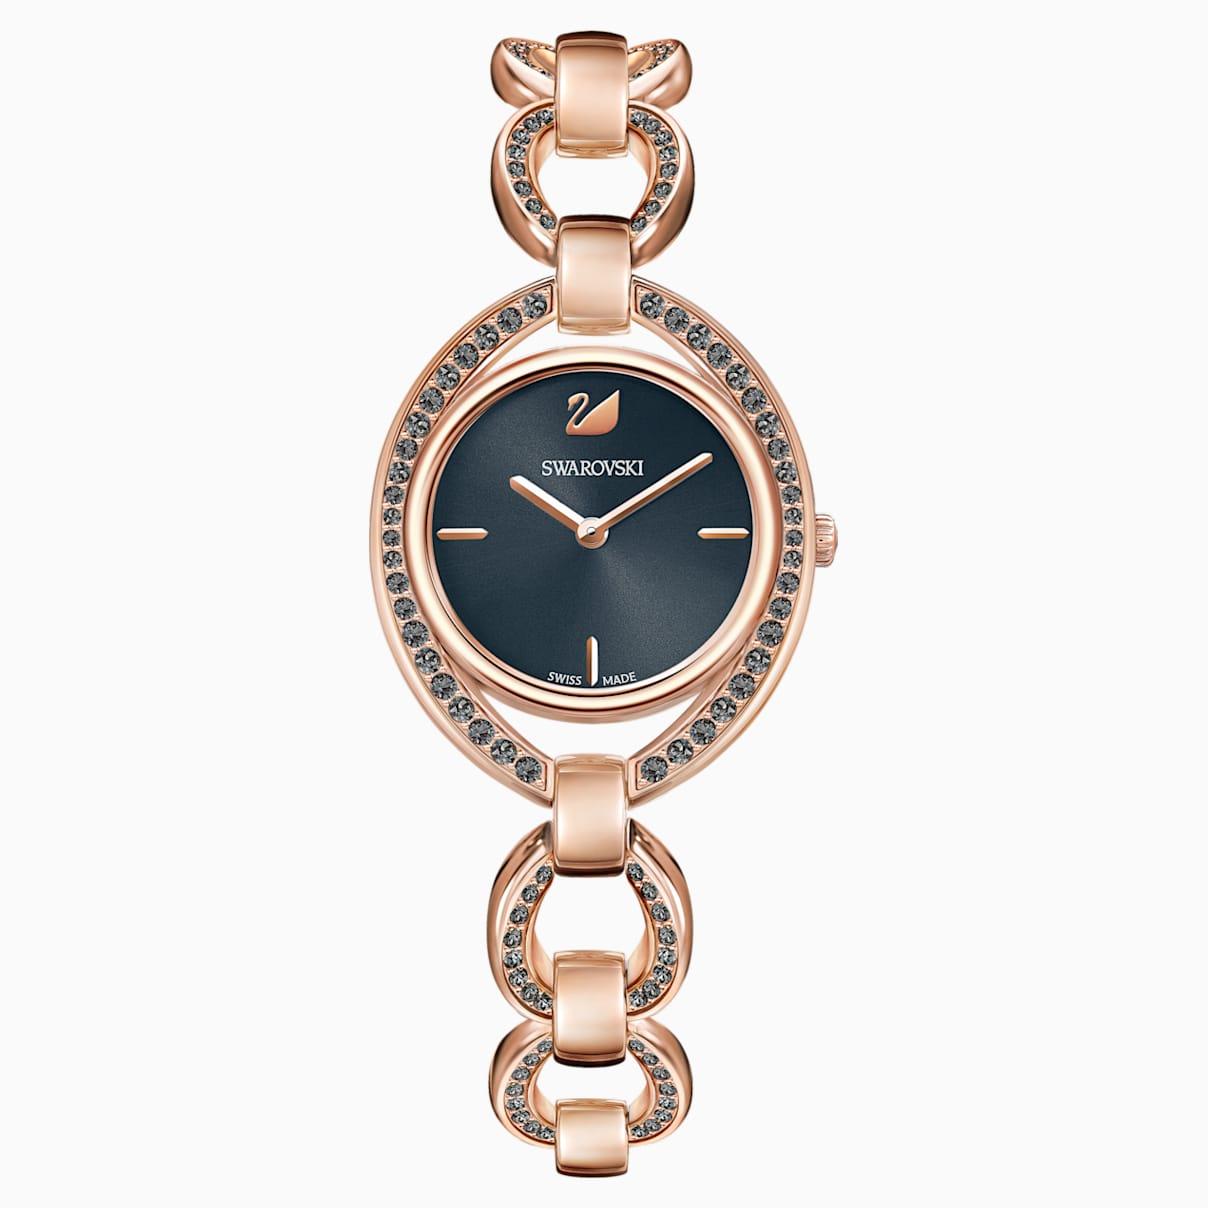 Stella Uhr, Metallarmband, dunkelgrau, Rosé vergoldetes PVD-Finish